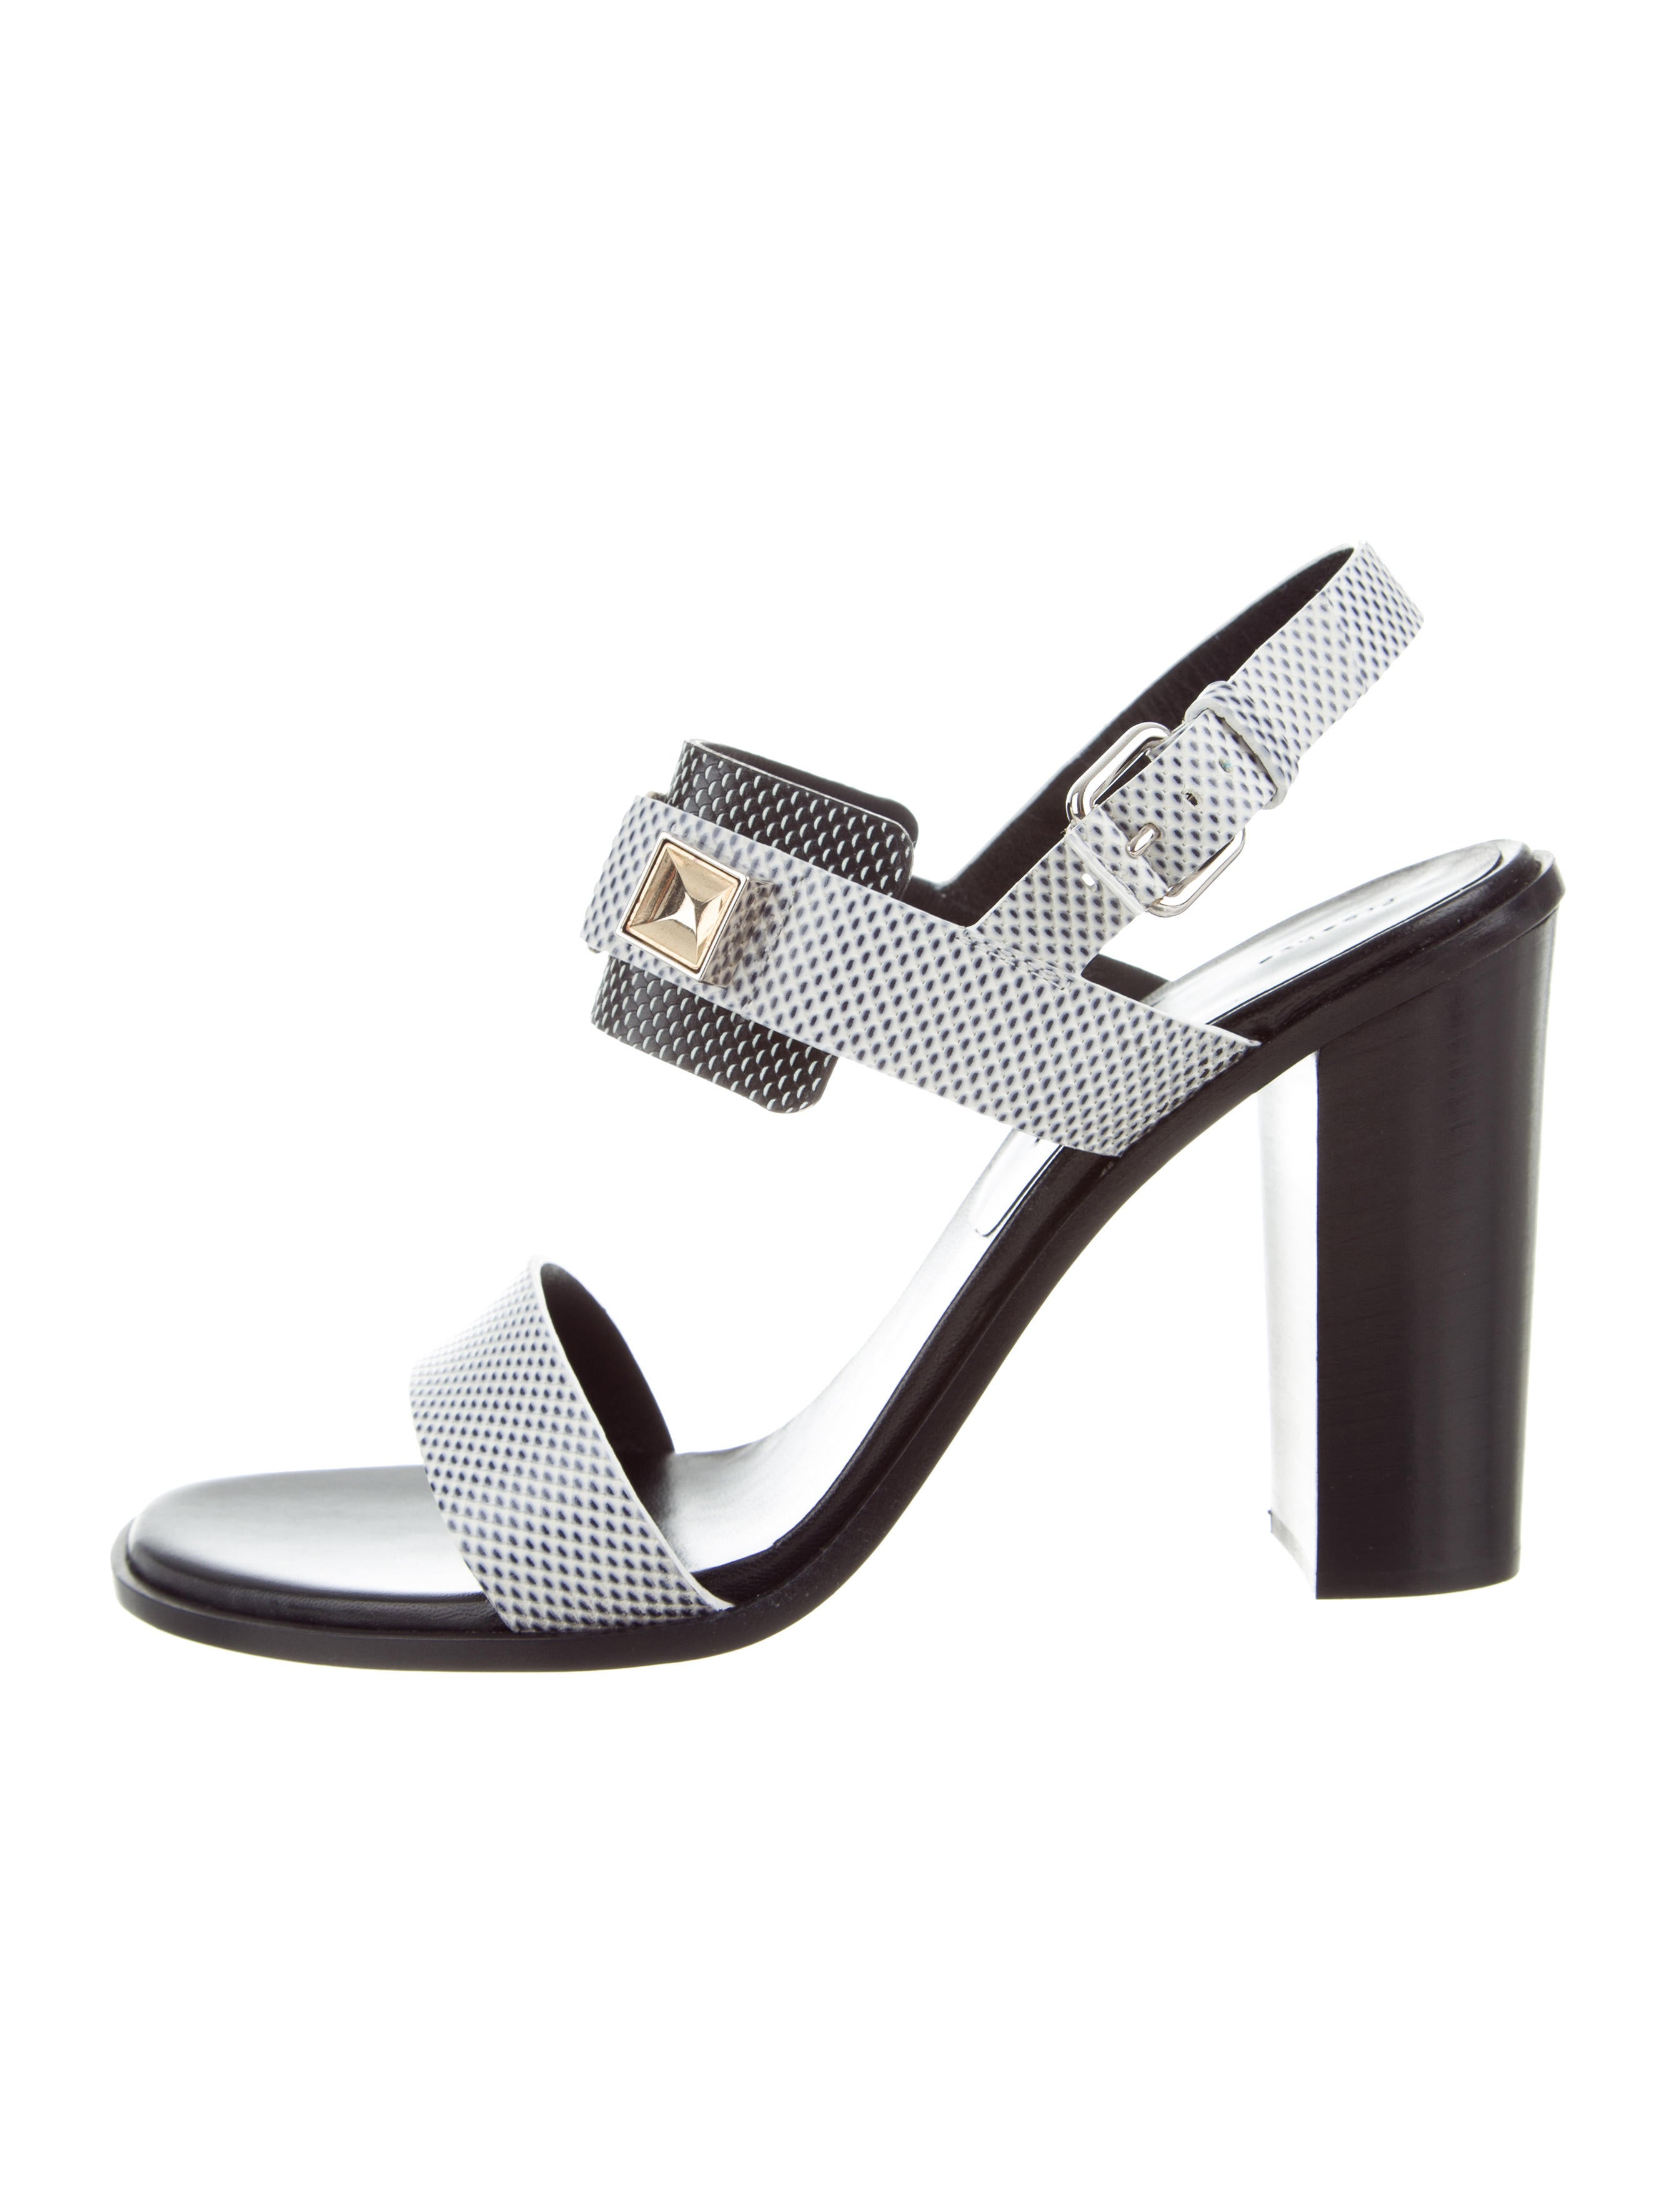 Proenza Schouler Harmon Leather Sandals w/ Tags cheap 2015 MyanX6Bpr6